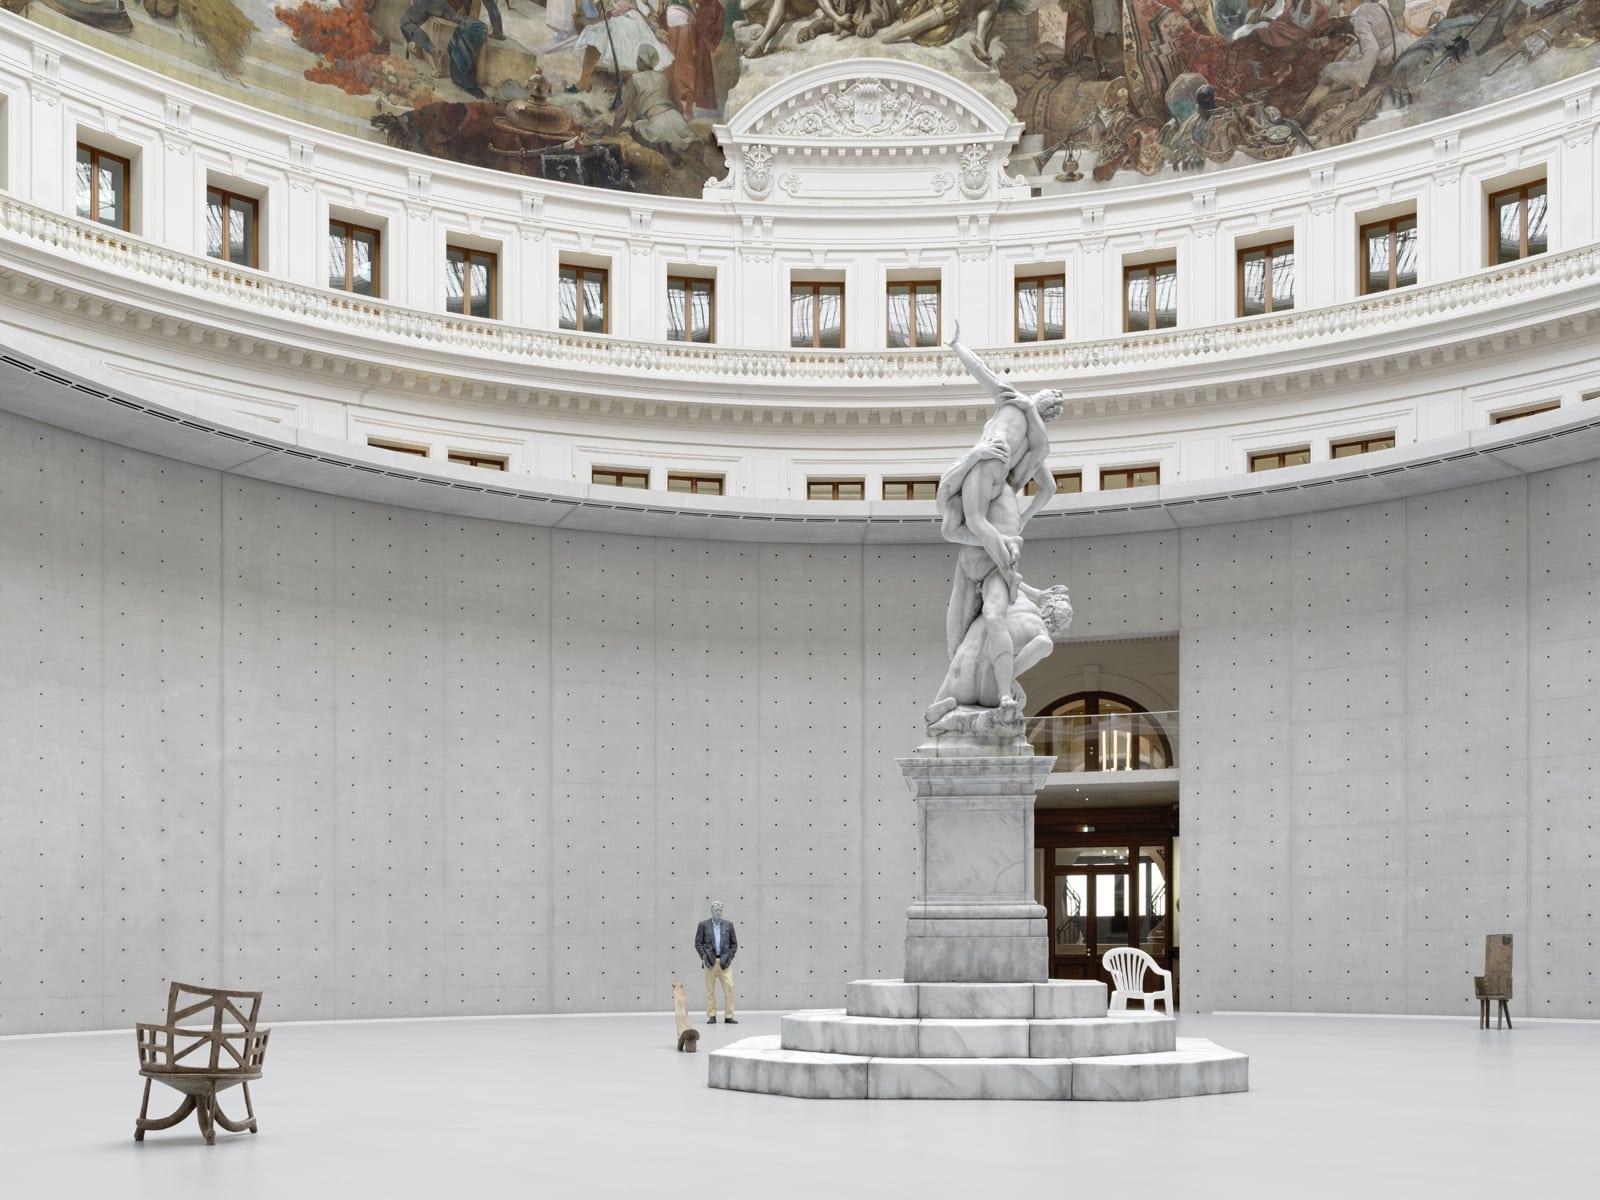 Pinault Museum  - 20210614 TadaoAndo MuseoPinault 01 StefanAltenburger 31